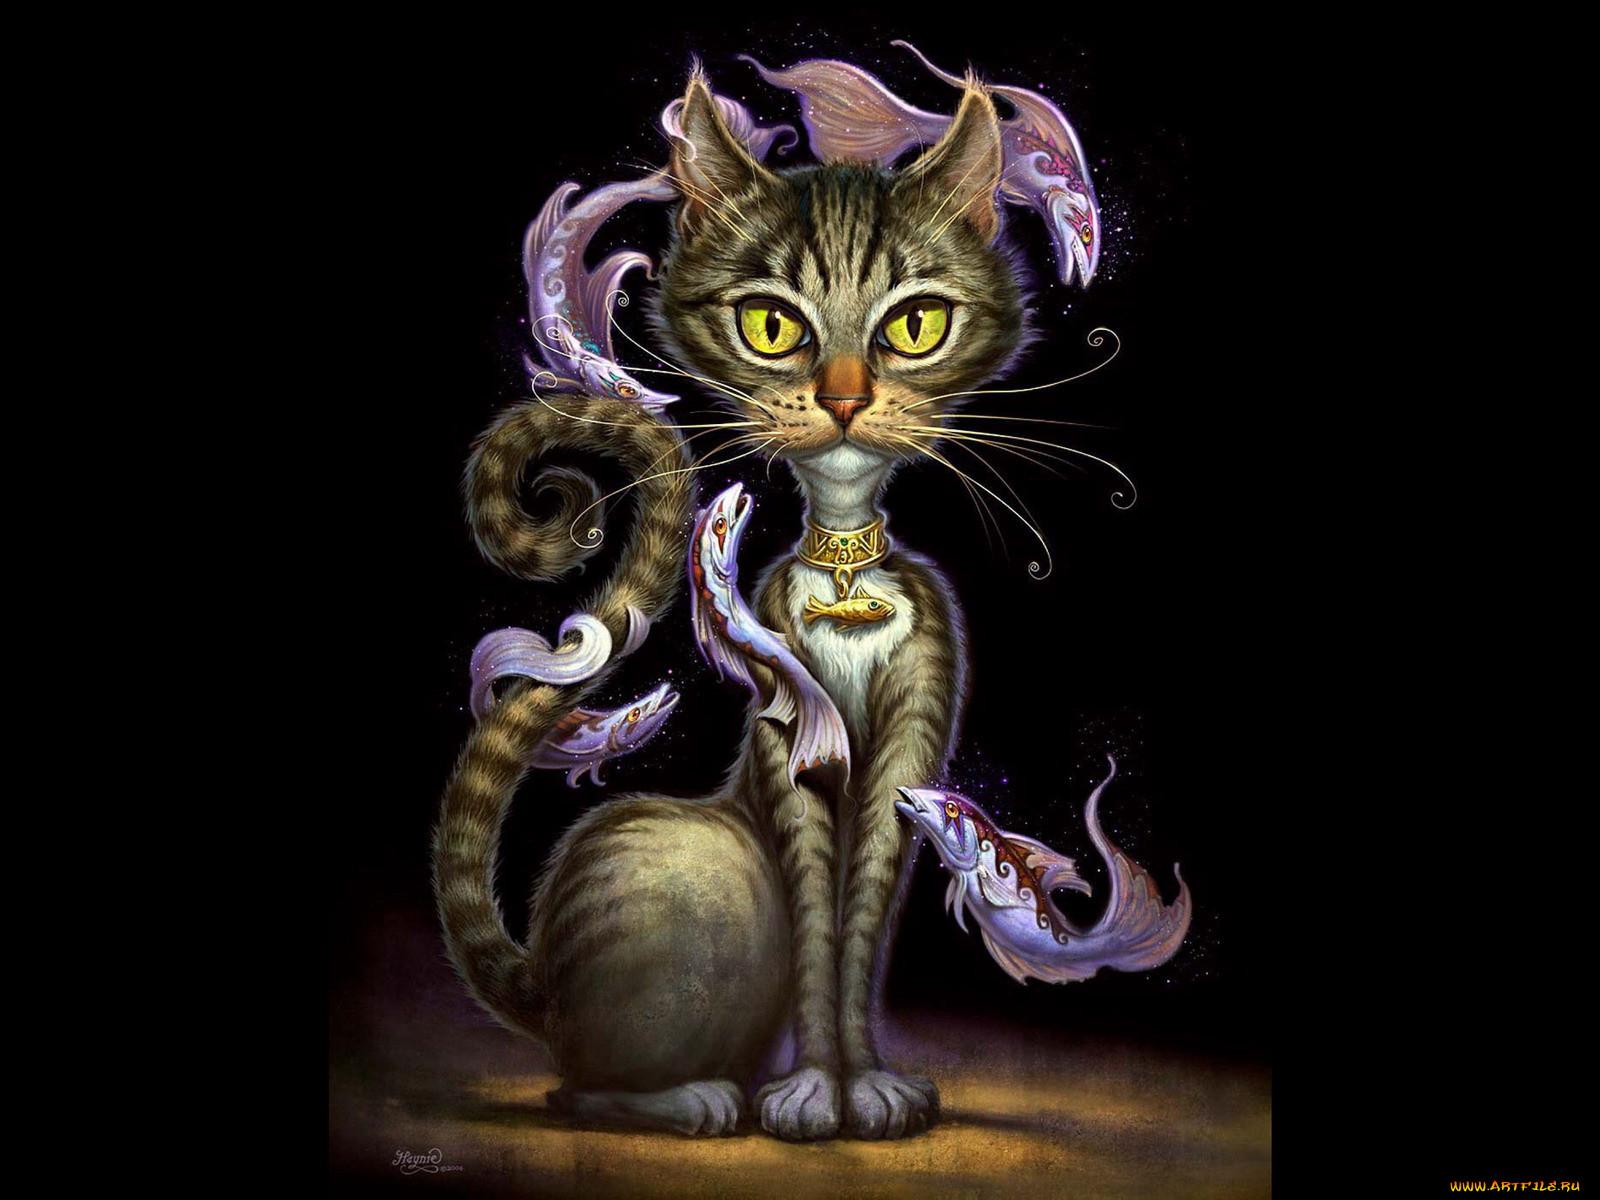 дорого кошки фентези картинки один самых